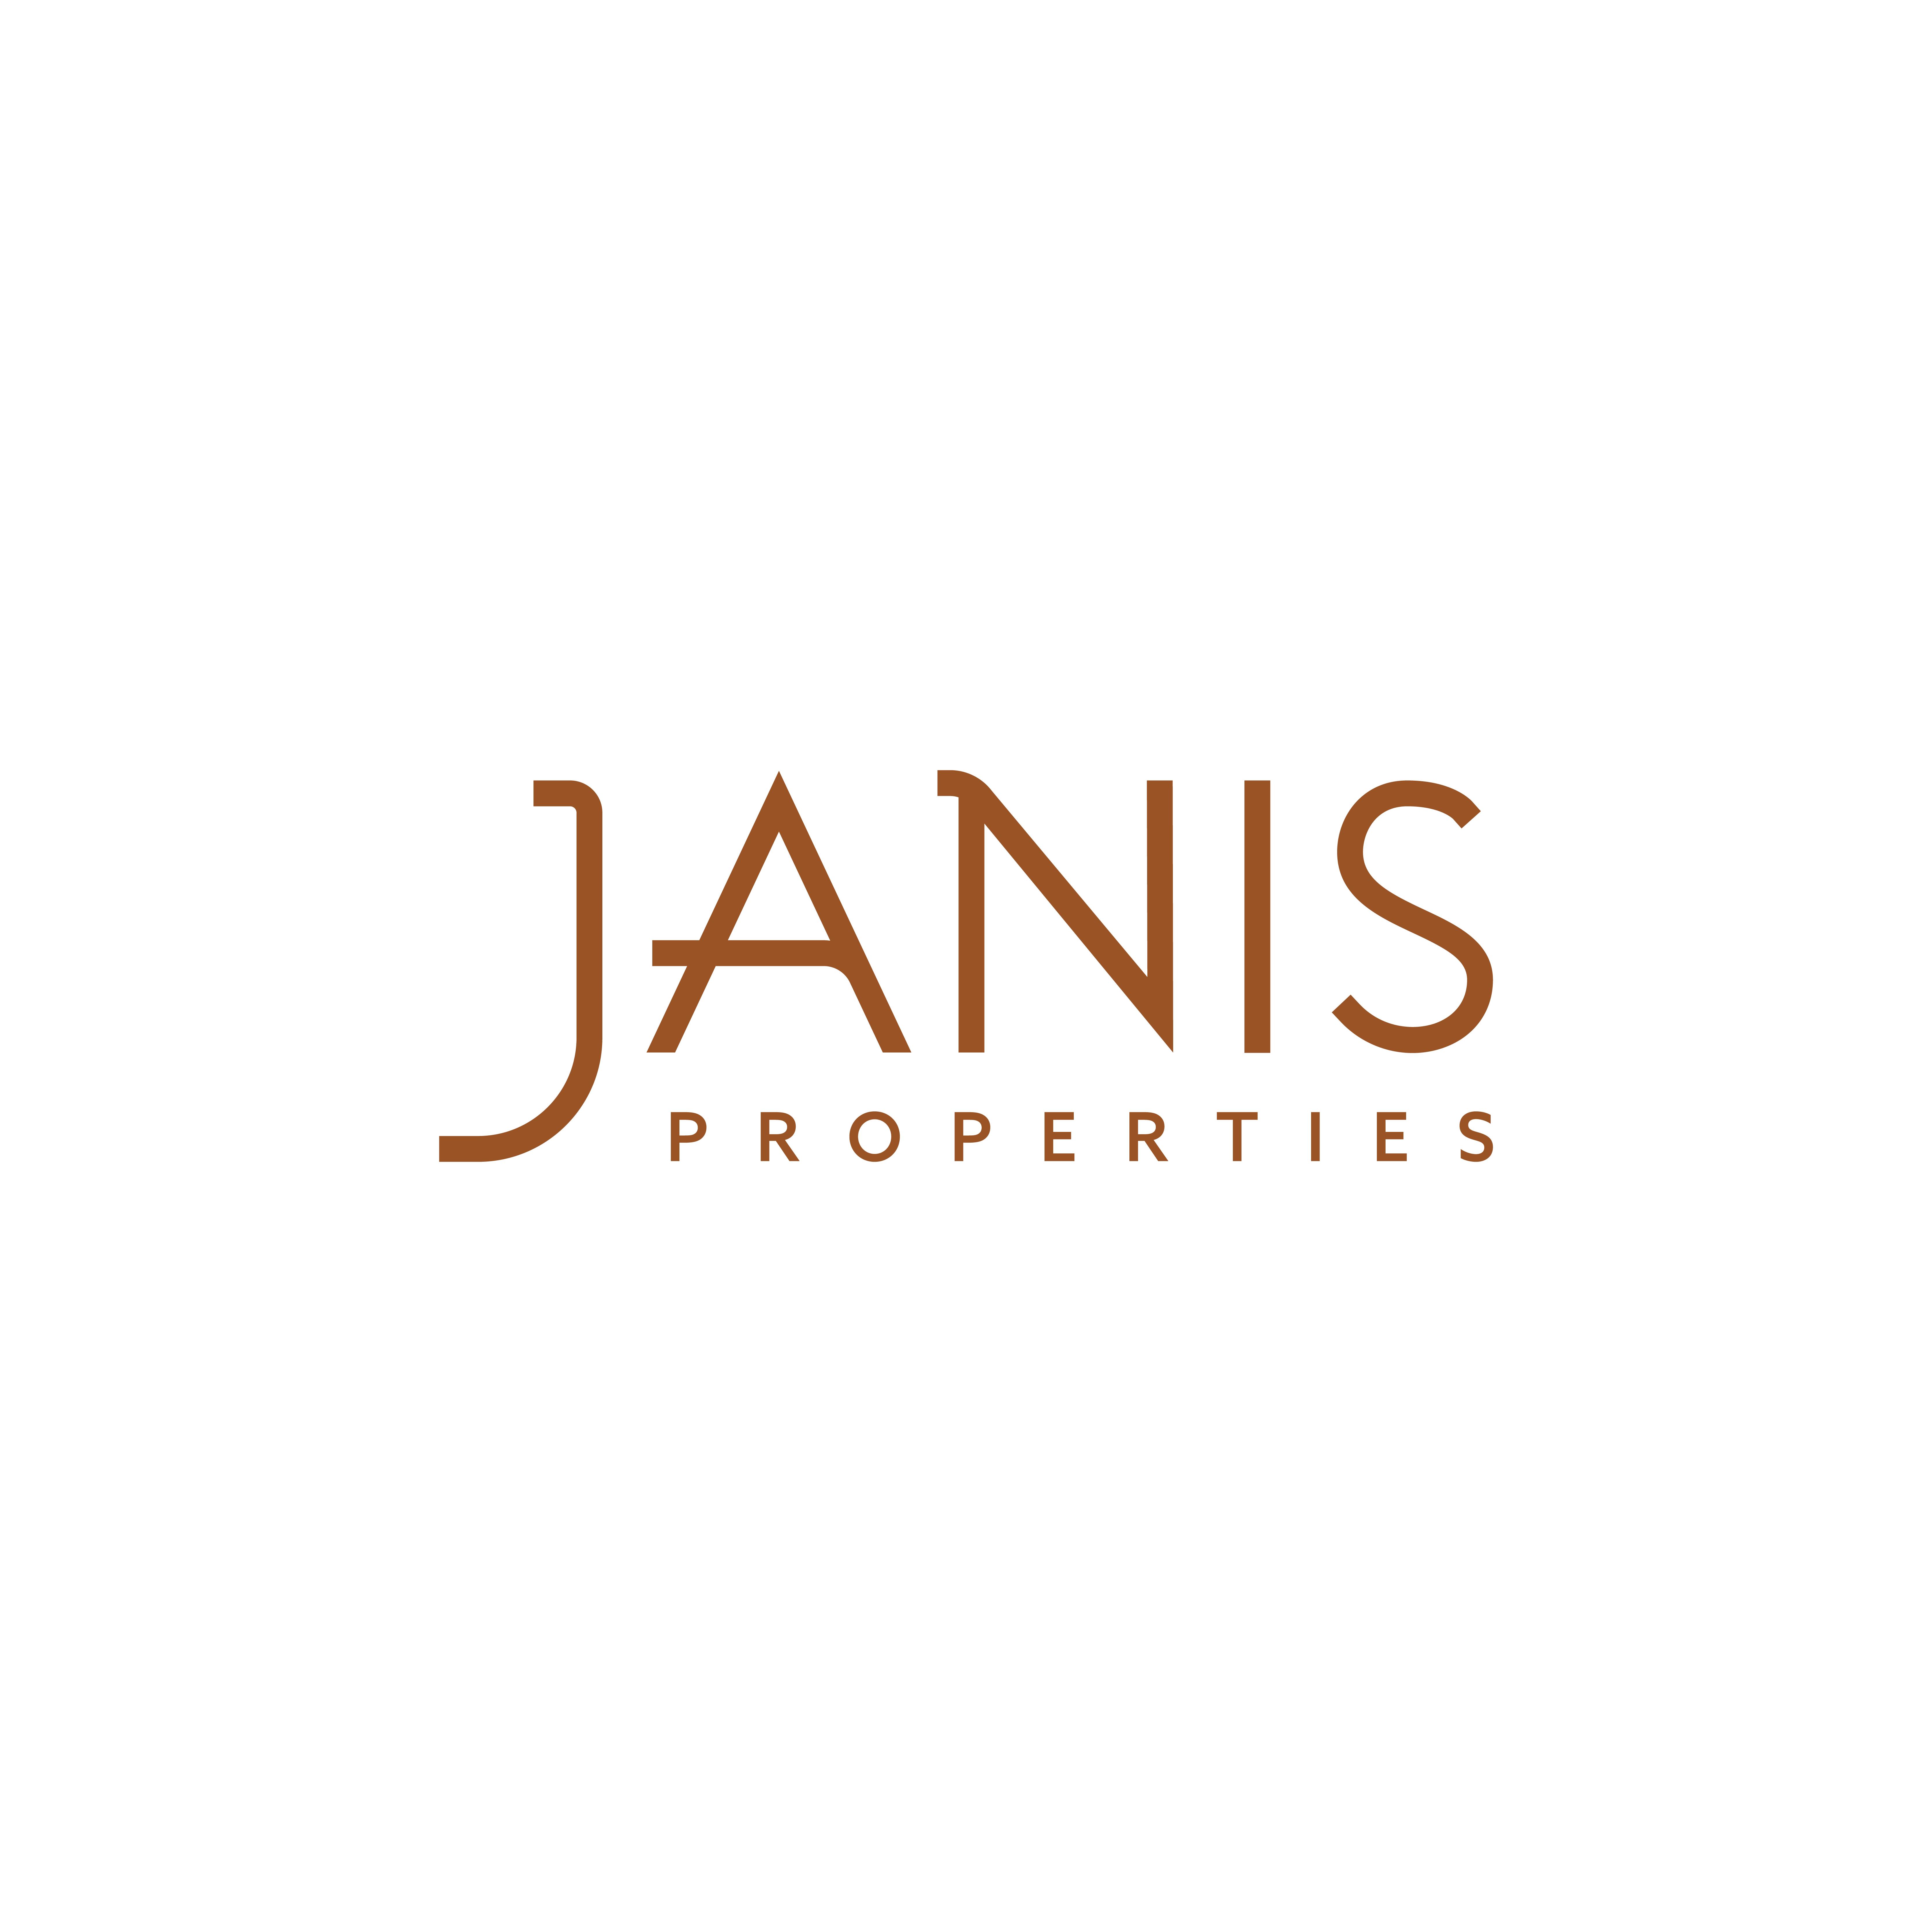 Janis Properties logo